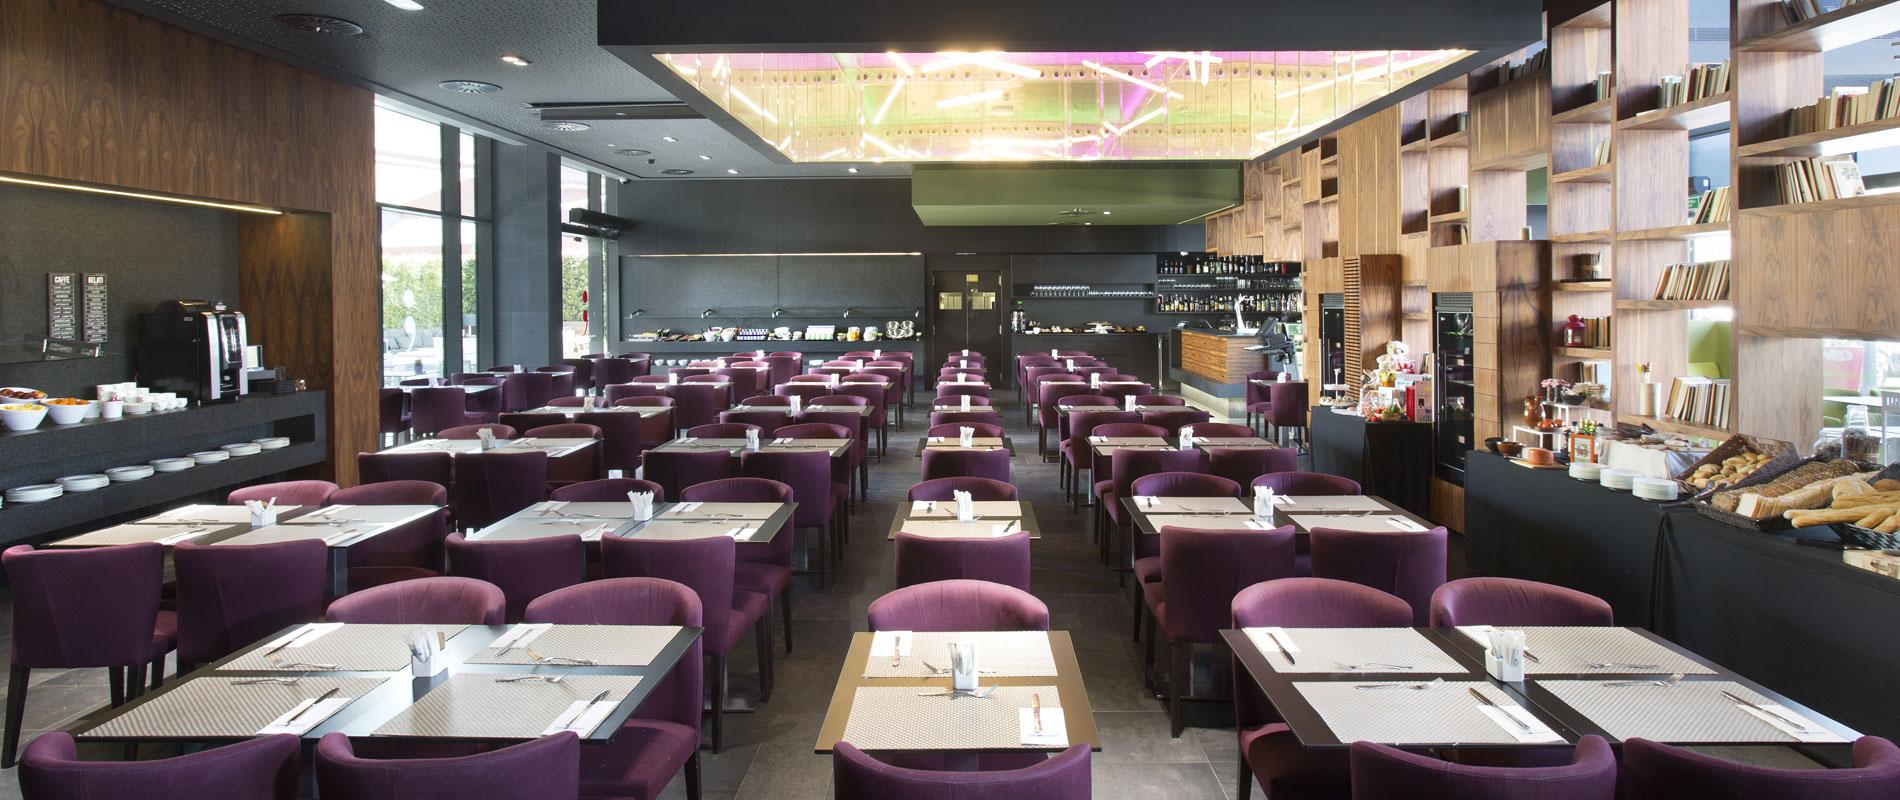 Restaurante punt i coma hotel sb plaza europa l 39 hospitalet - Restaurante al punt ...